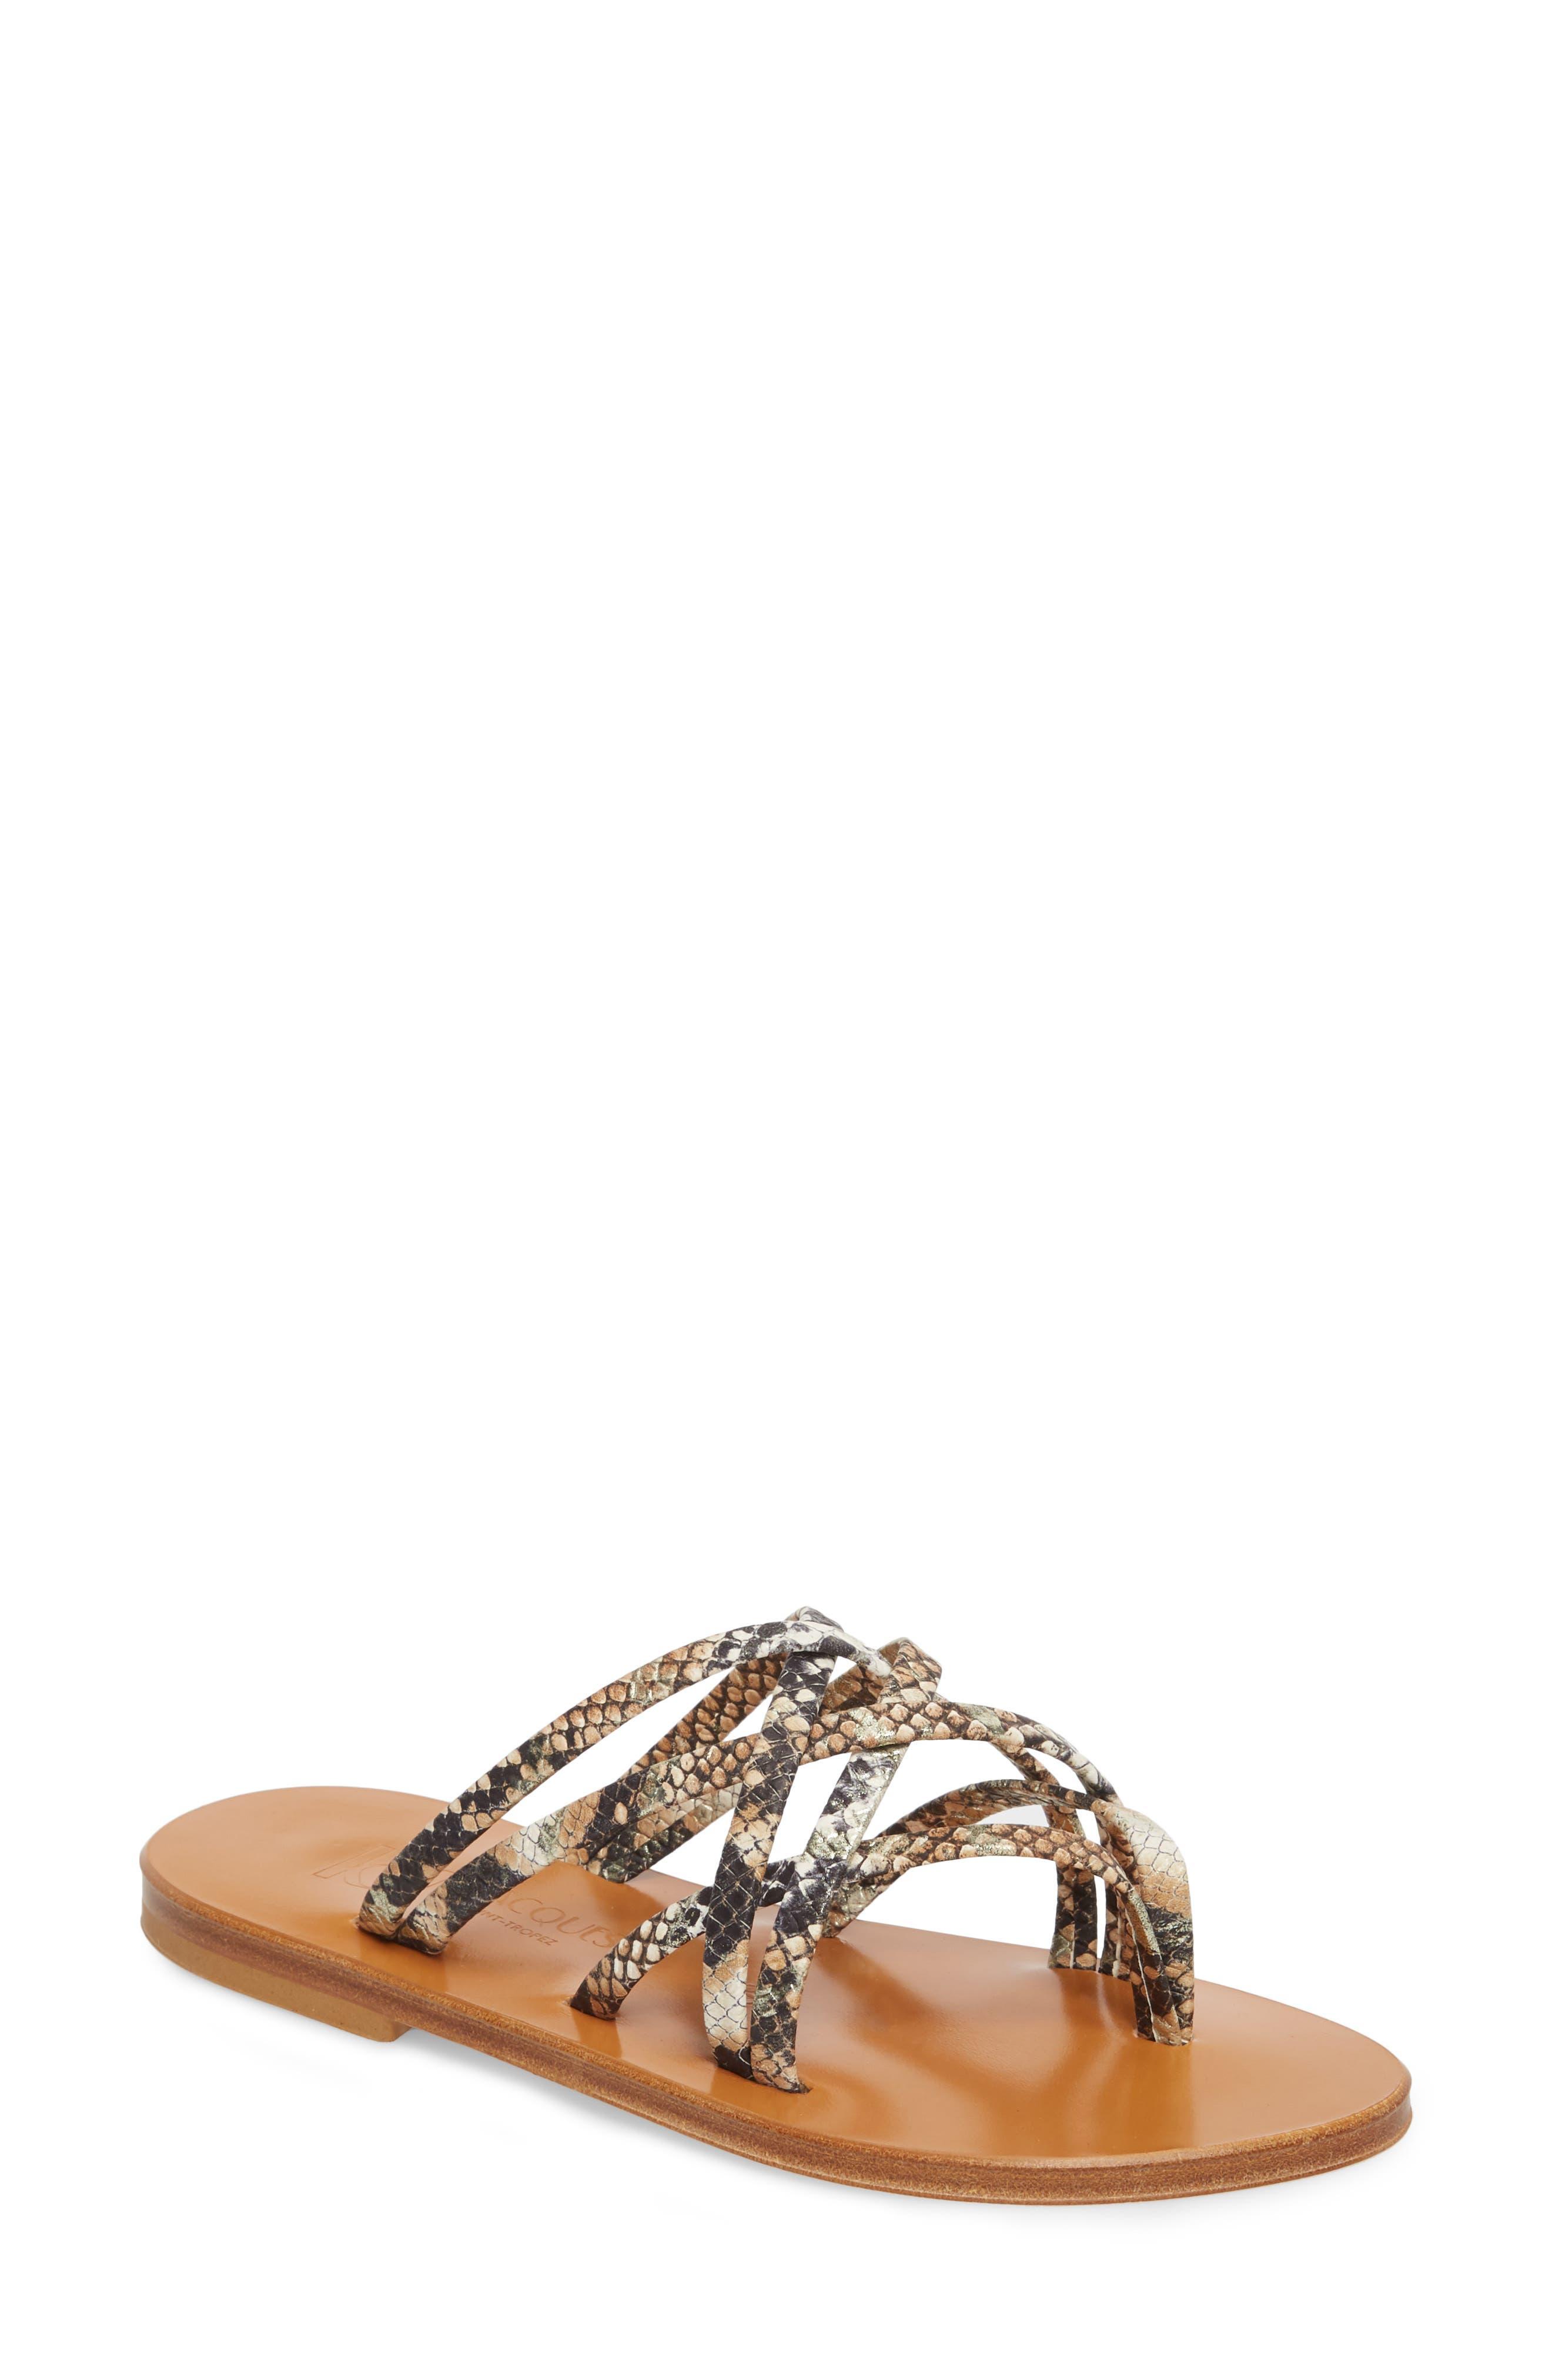 K. Jacques St. Tropez Strappy Thong Sandal,                         Main,                         color, Hawai Arce